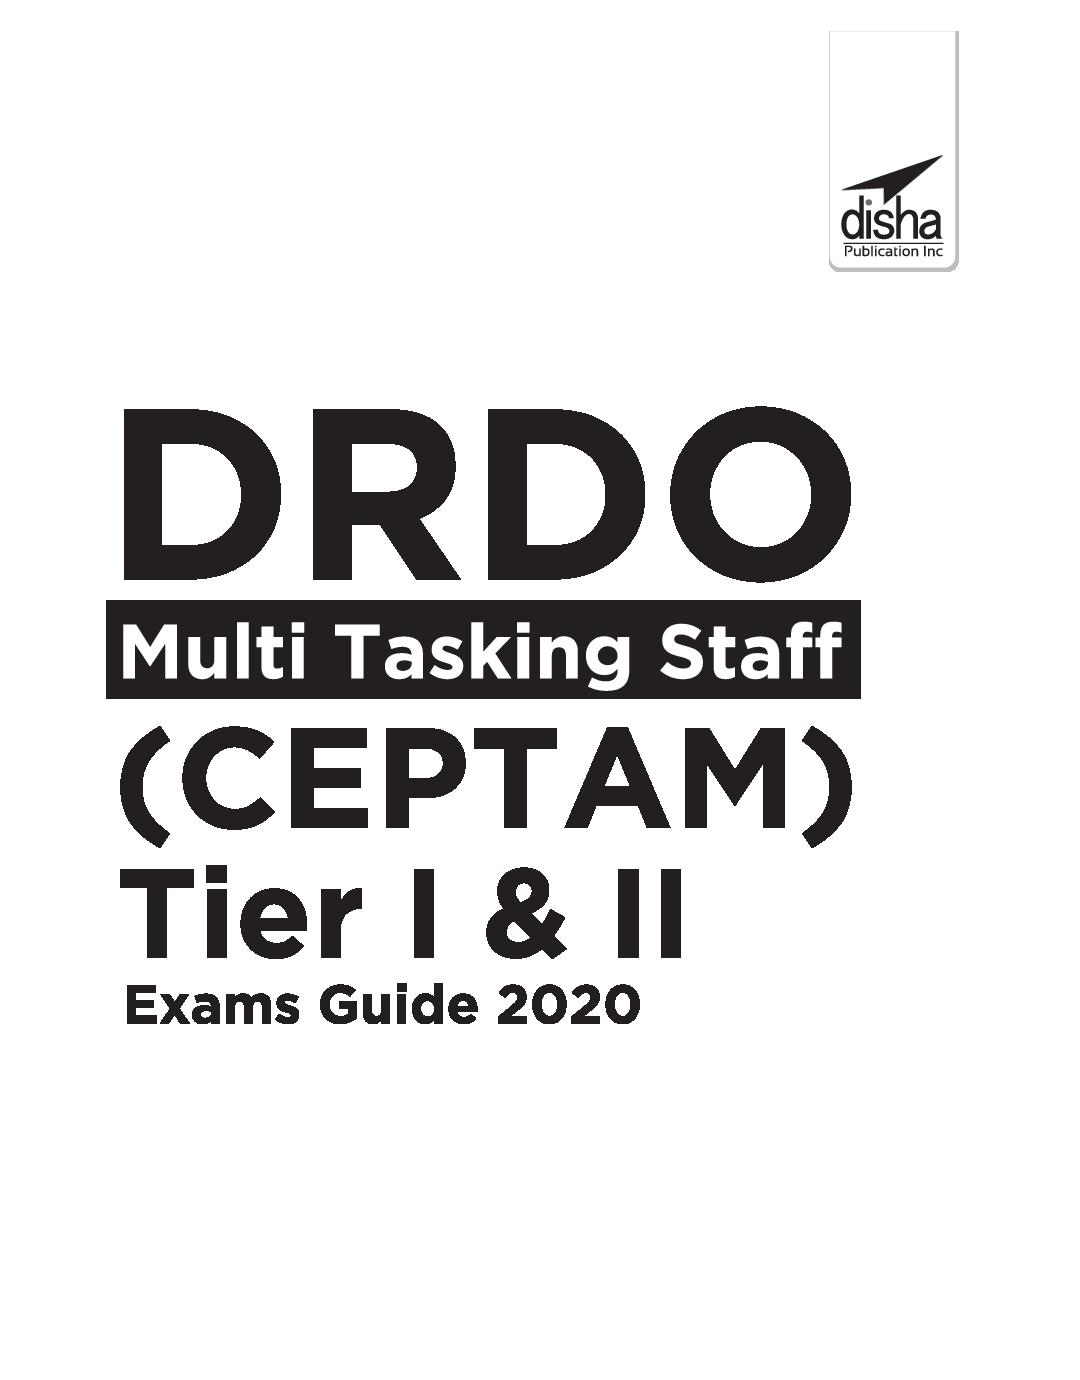 DRDO Multi Tasking Staff (CEPTAM) Tier I & II Exam Guide 2020 - Page 2